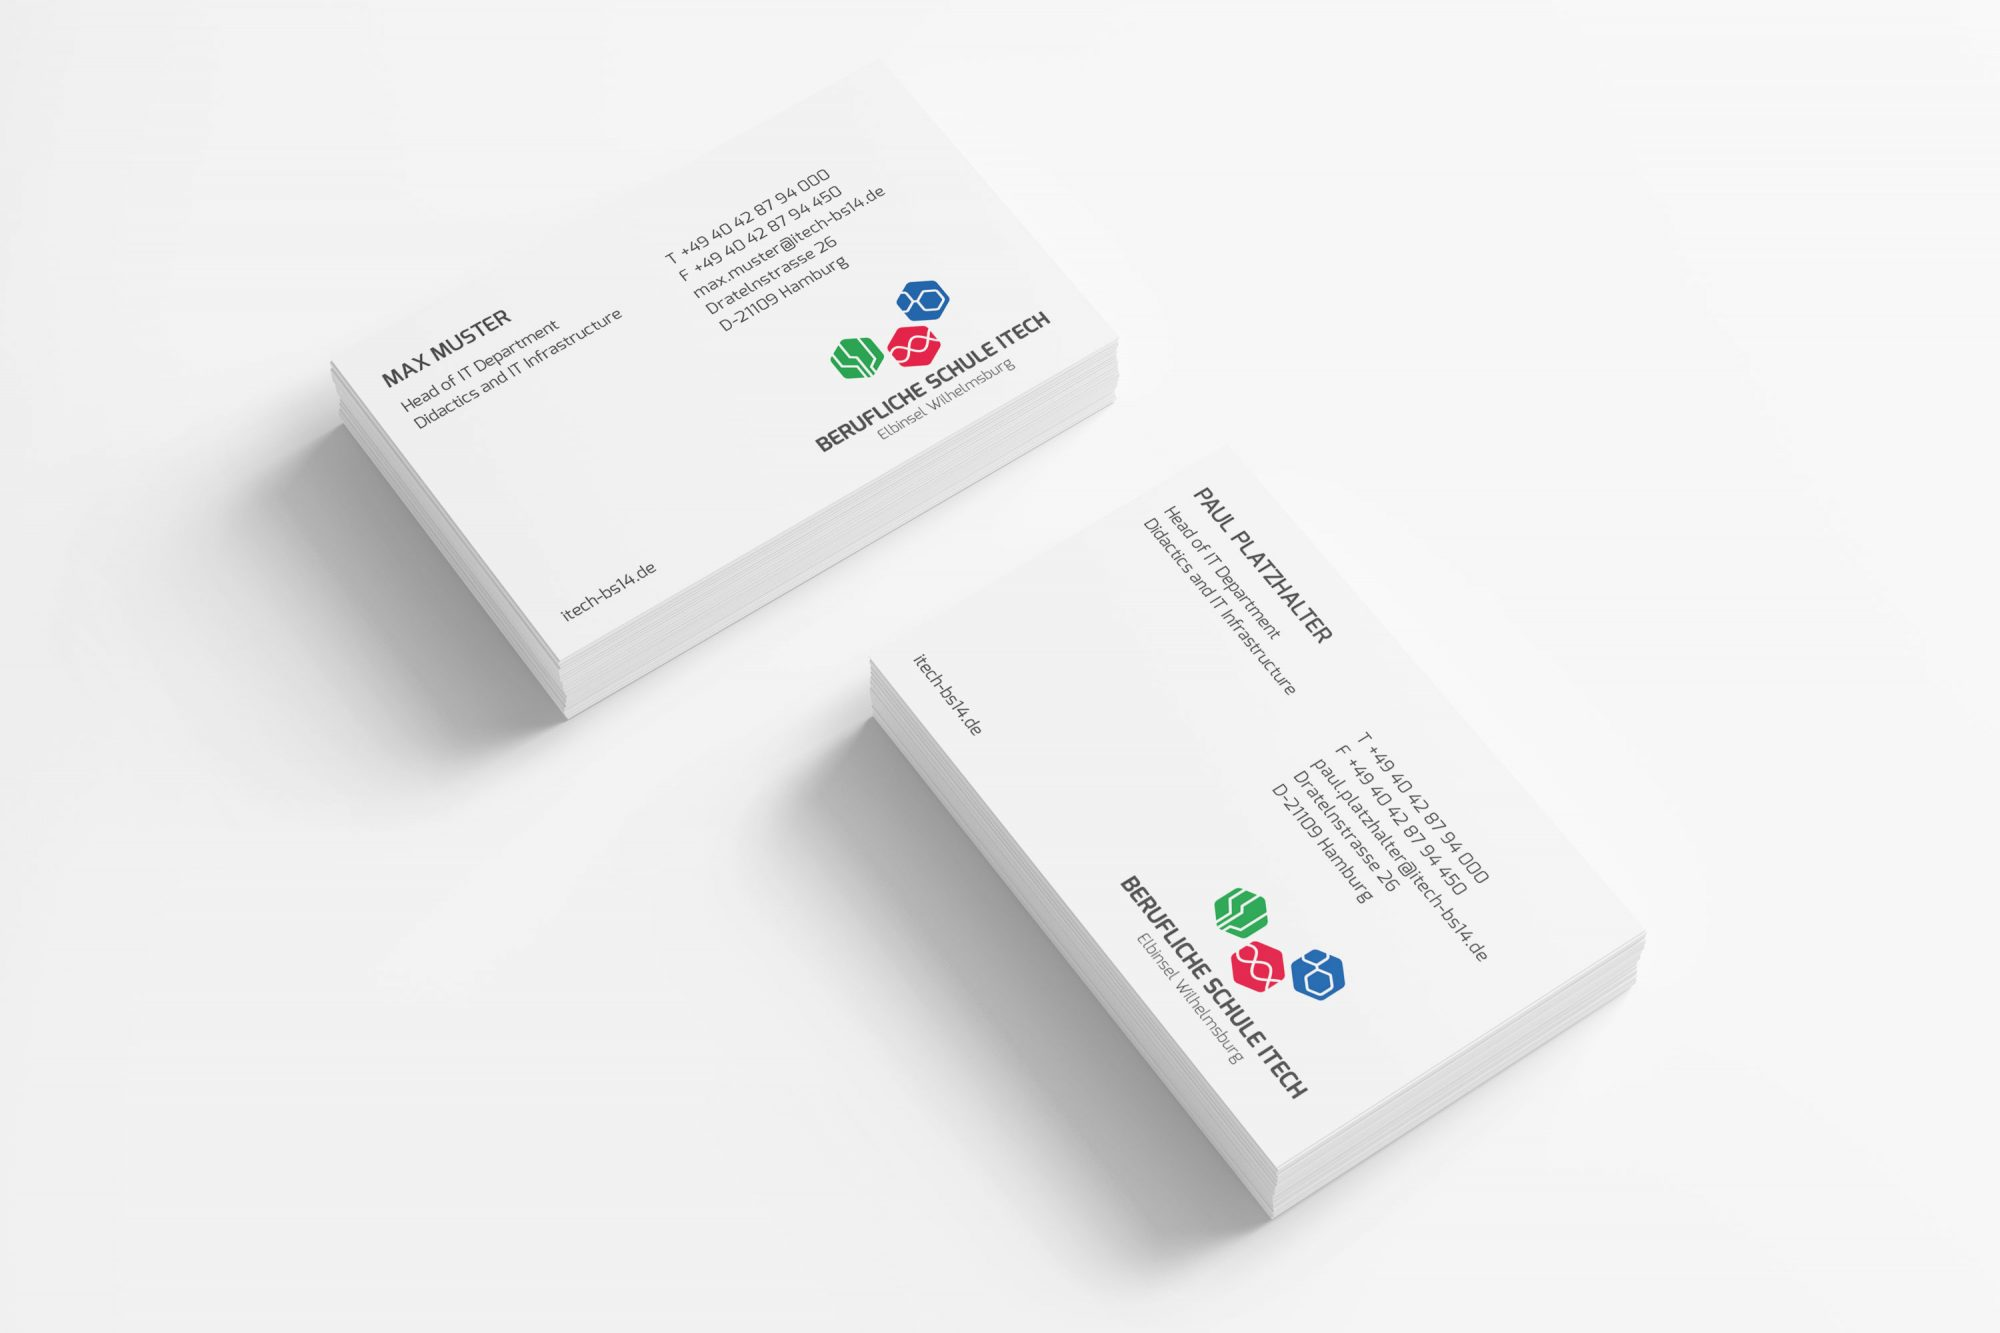 bs-itech-corporate-design visitenkarten